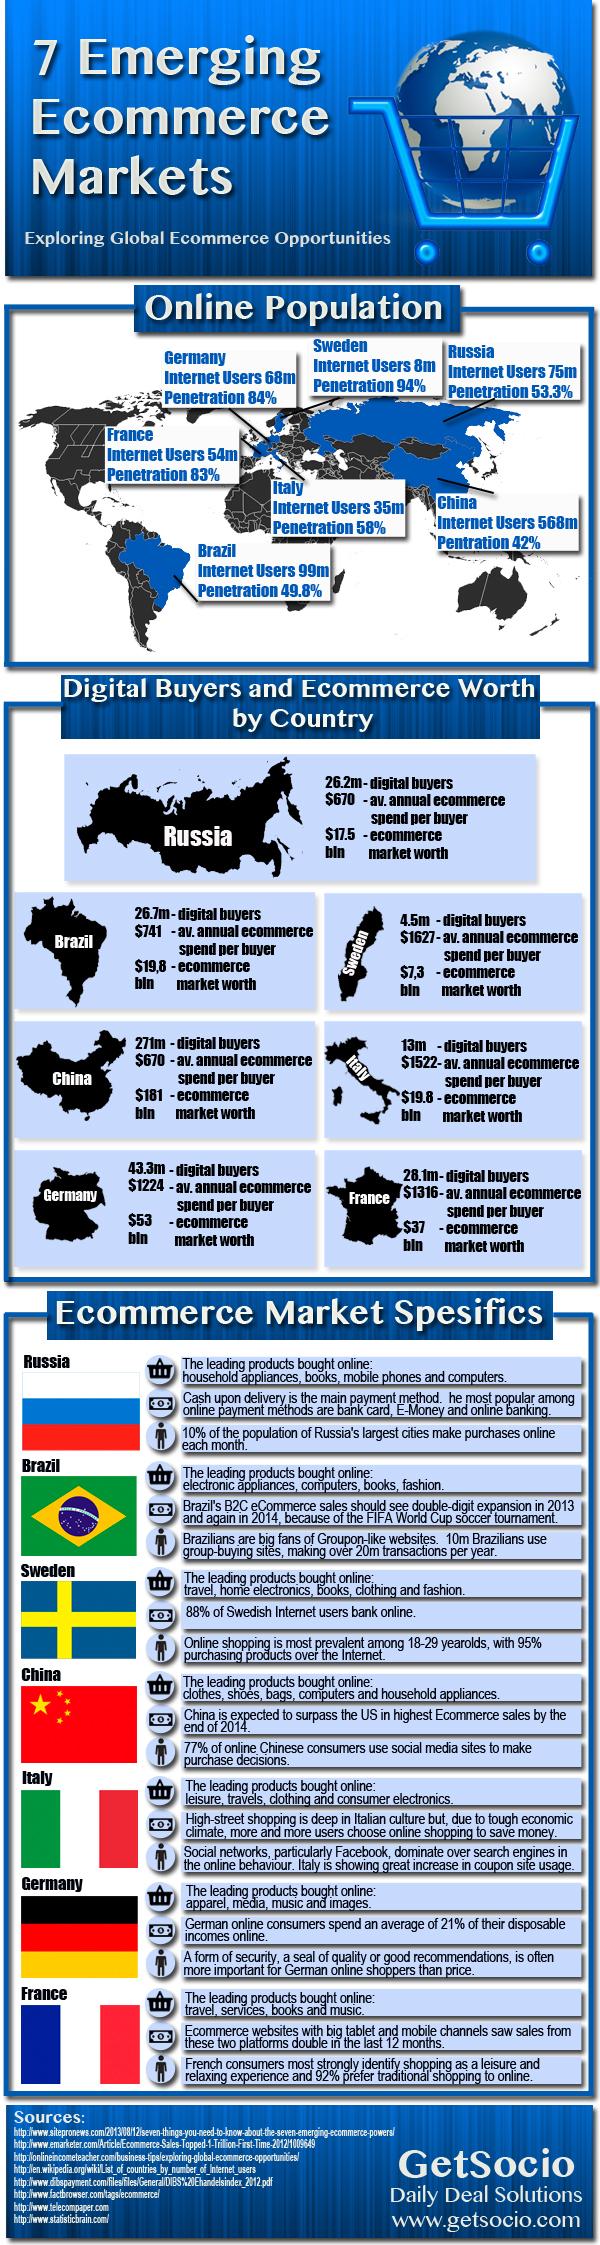 7-emerging-ecommerce-markets_52136ded46536